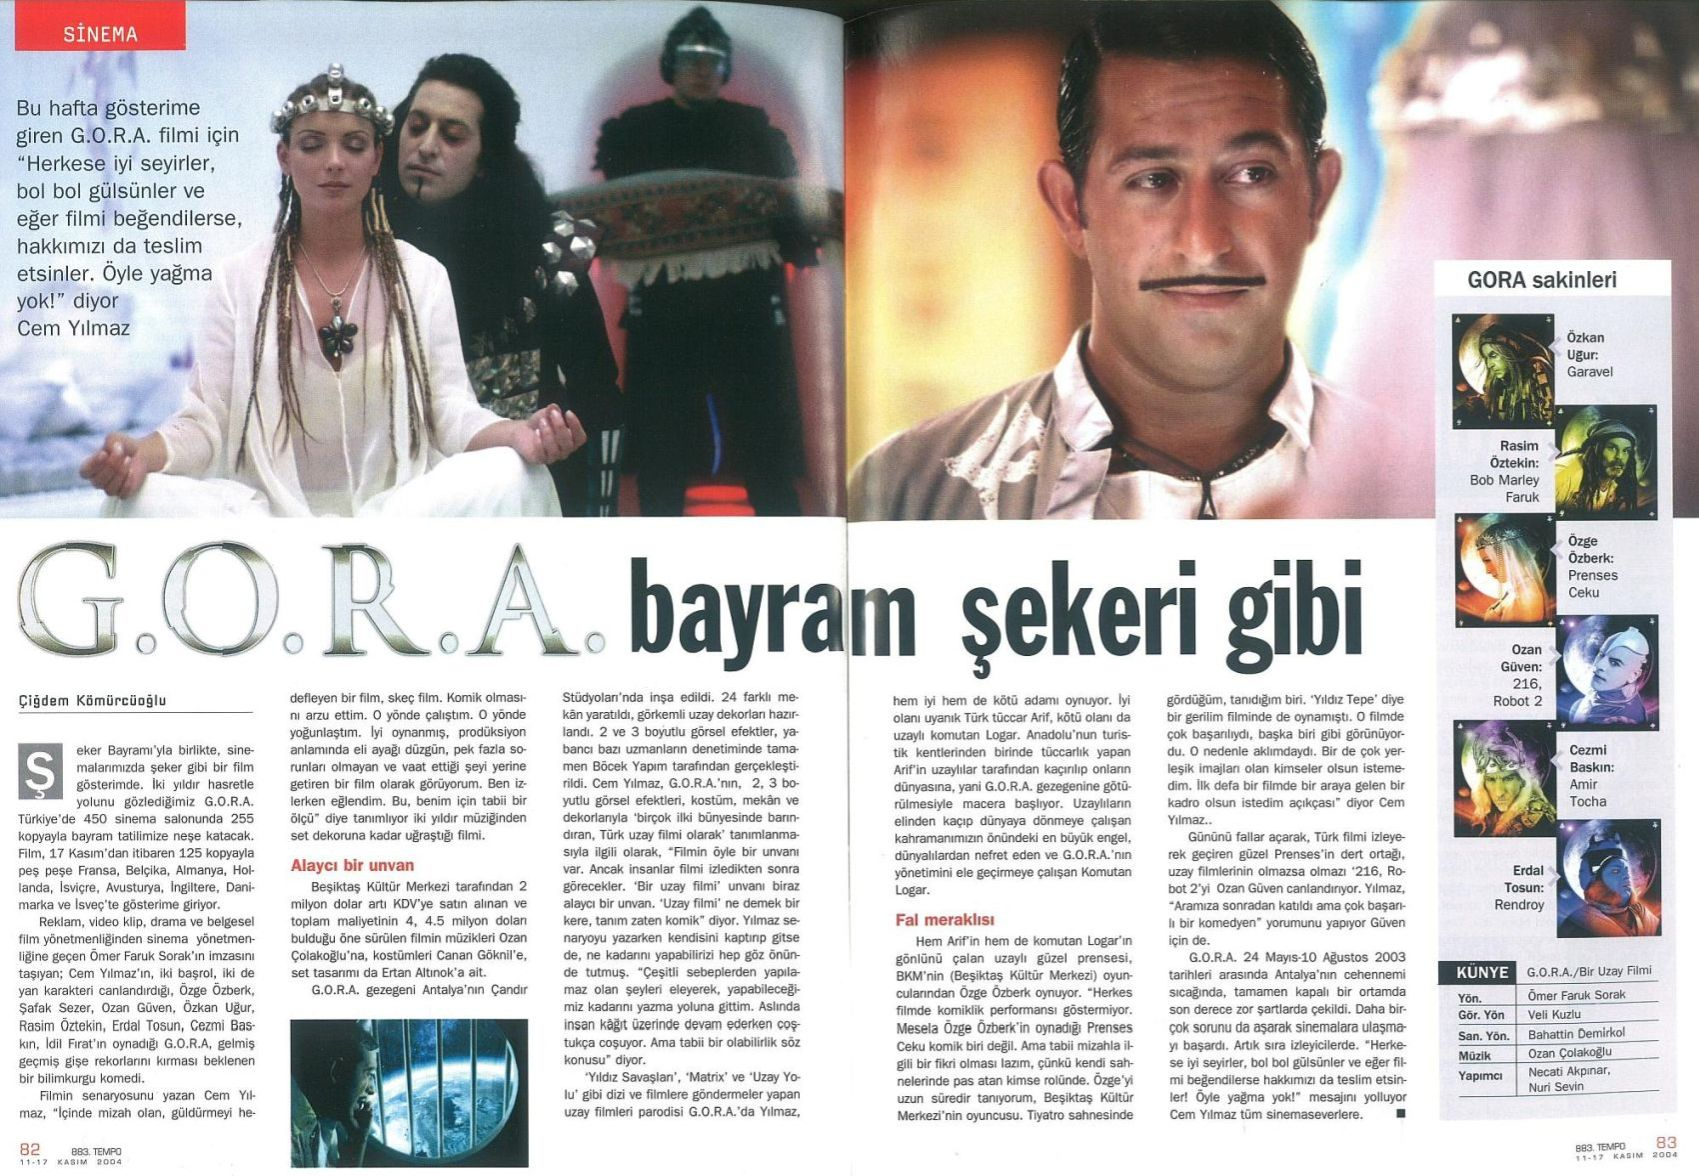 0215-gora-filmi-ne-zaman-cekildi-2004-tempo-dergisi-cem-yilmaz-roportaji (4)